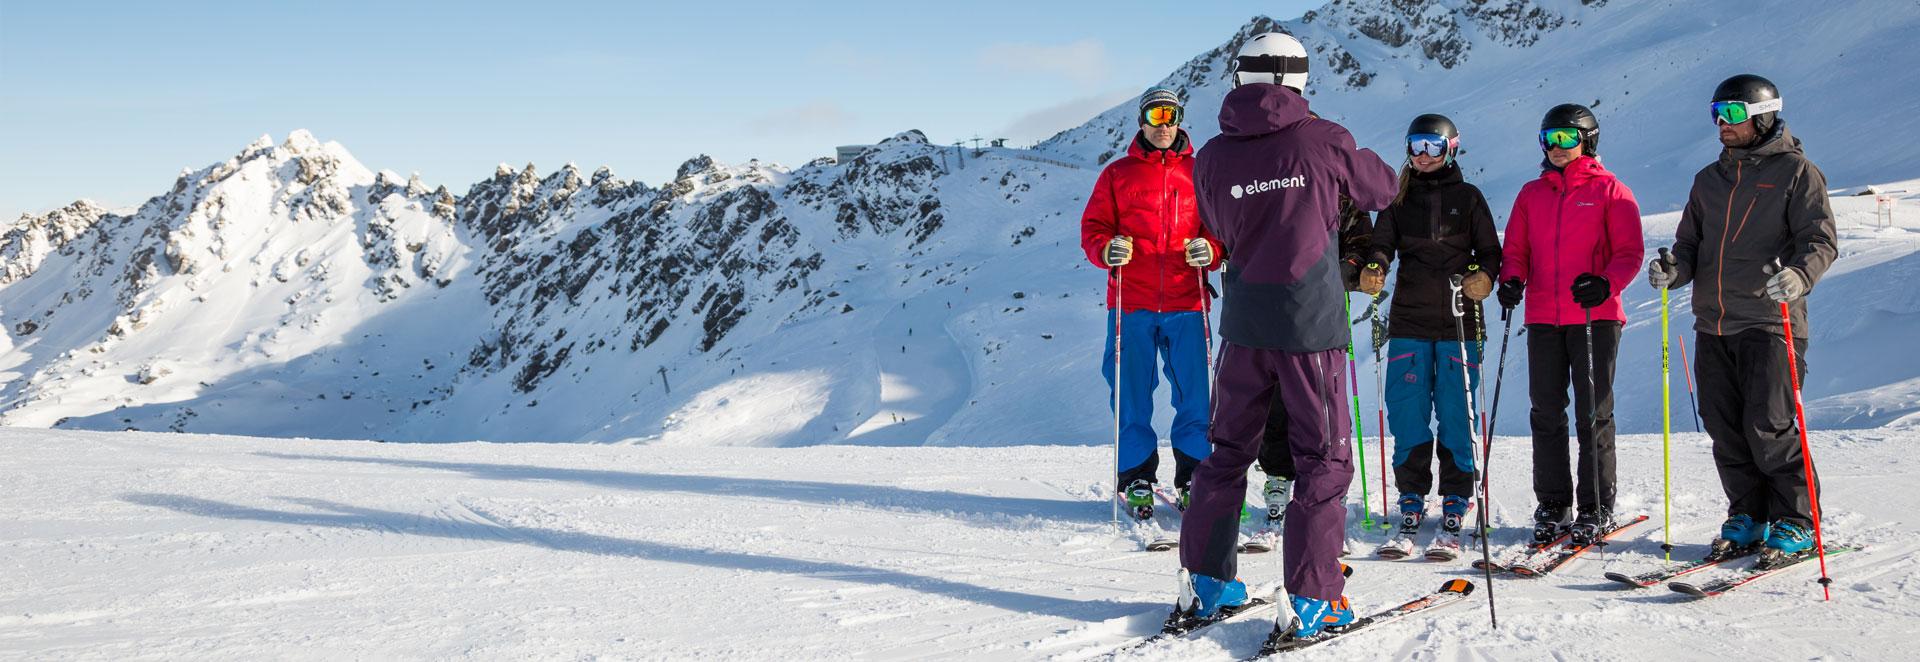 Verbier ISIA ski instructor training group